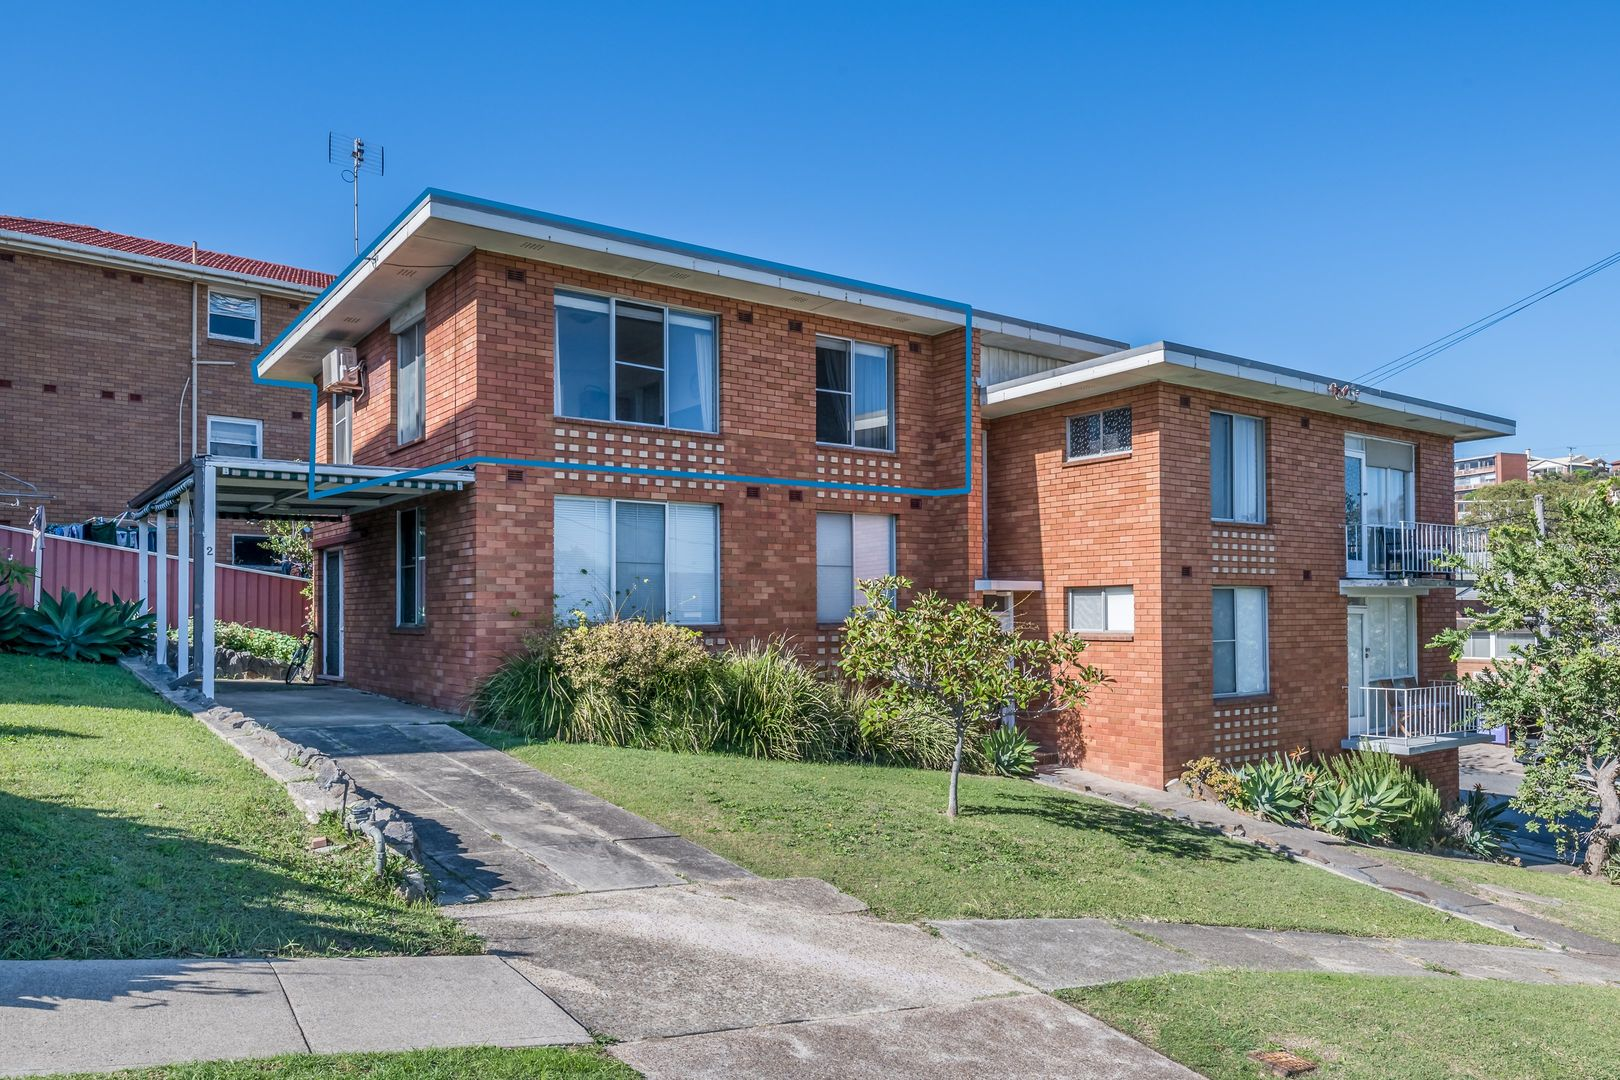 4/1 Mosbri Crescent, The Hill NSW 2300